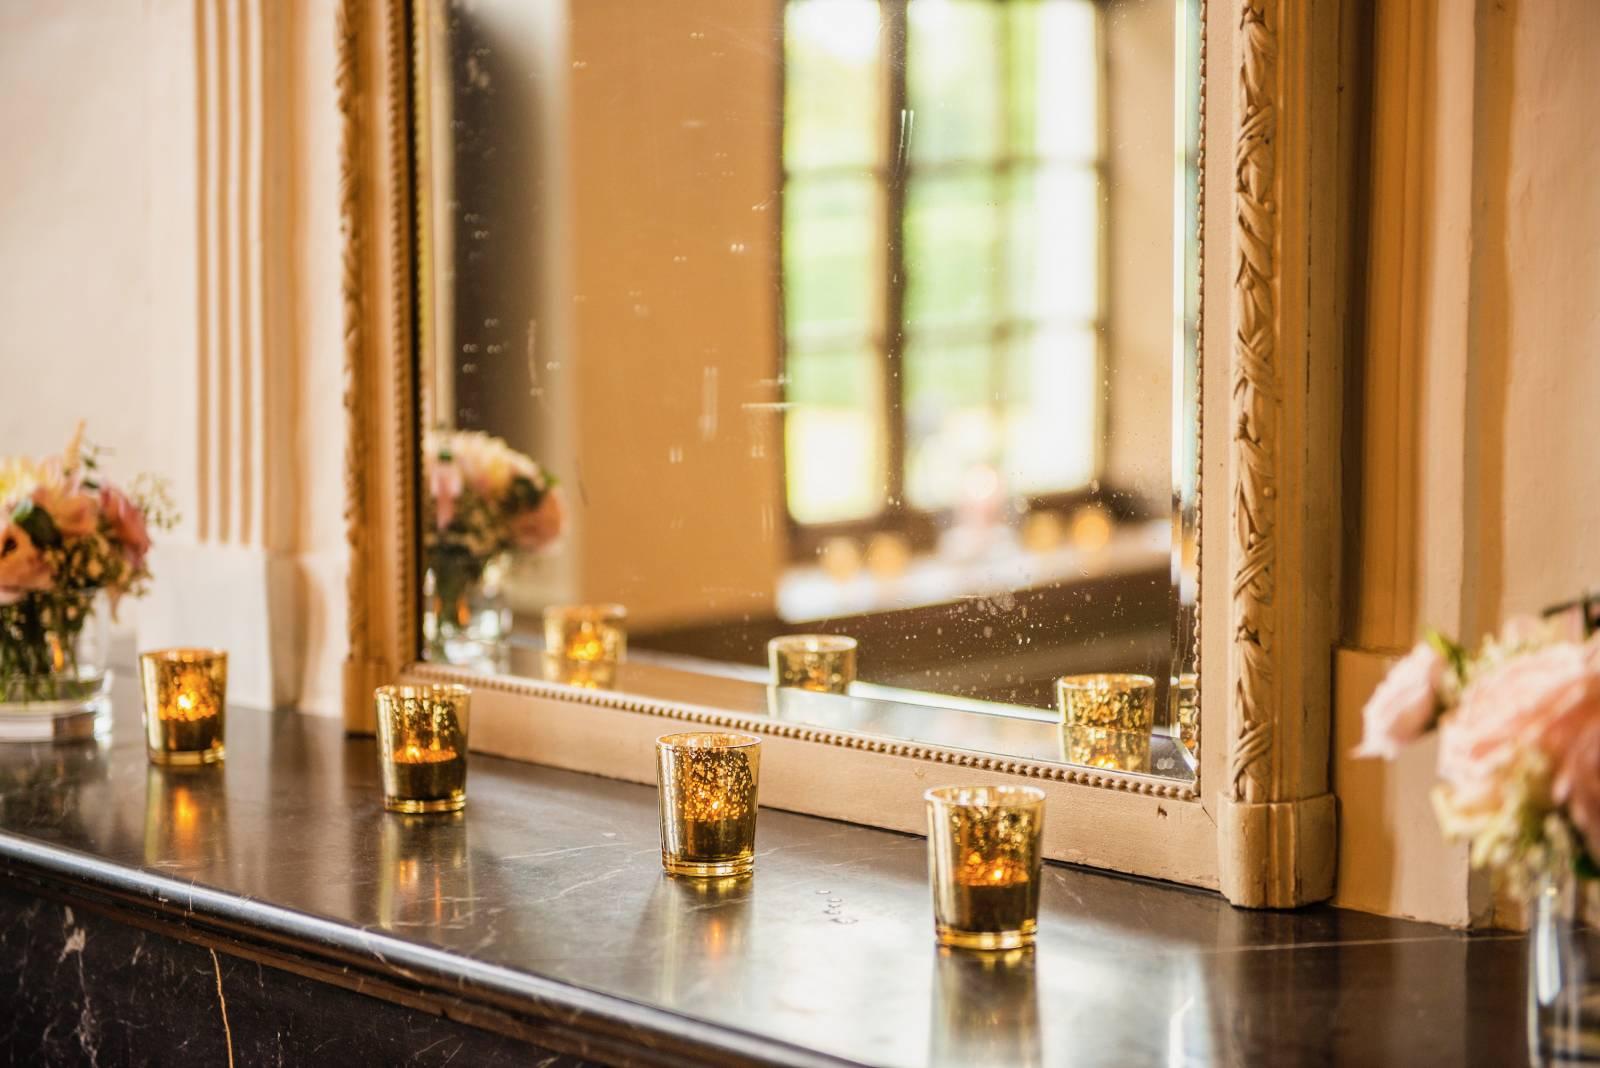 Atelier Rosé - Wedding Planner - House of Weddings Lise & Thomas - Ushua Goeminne (2)